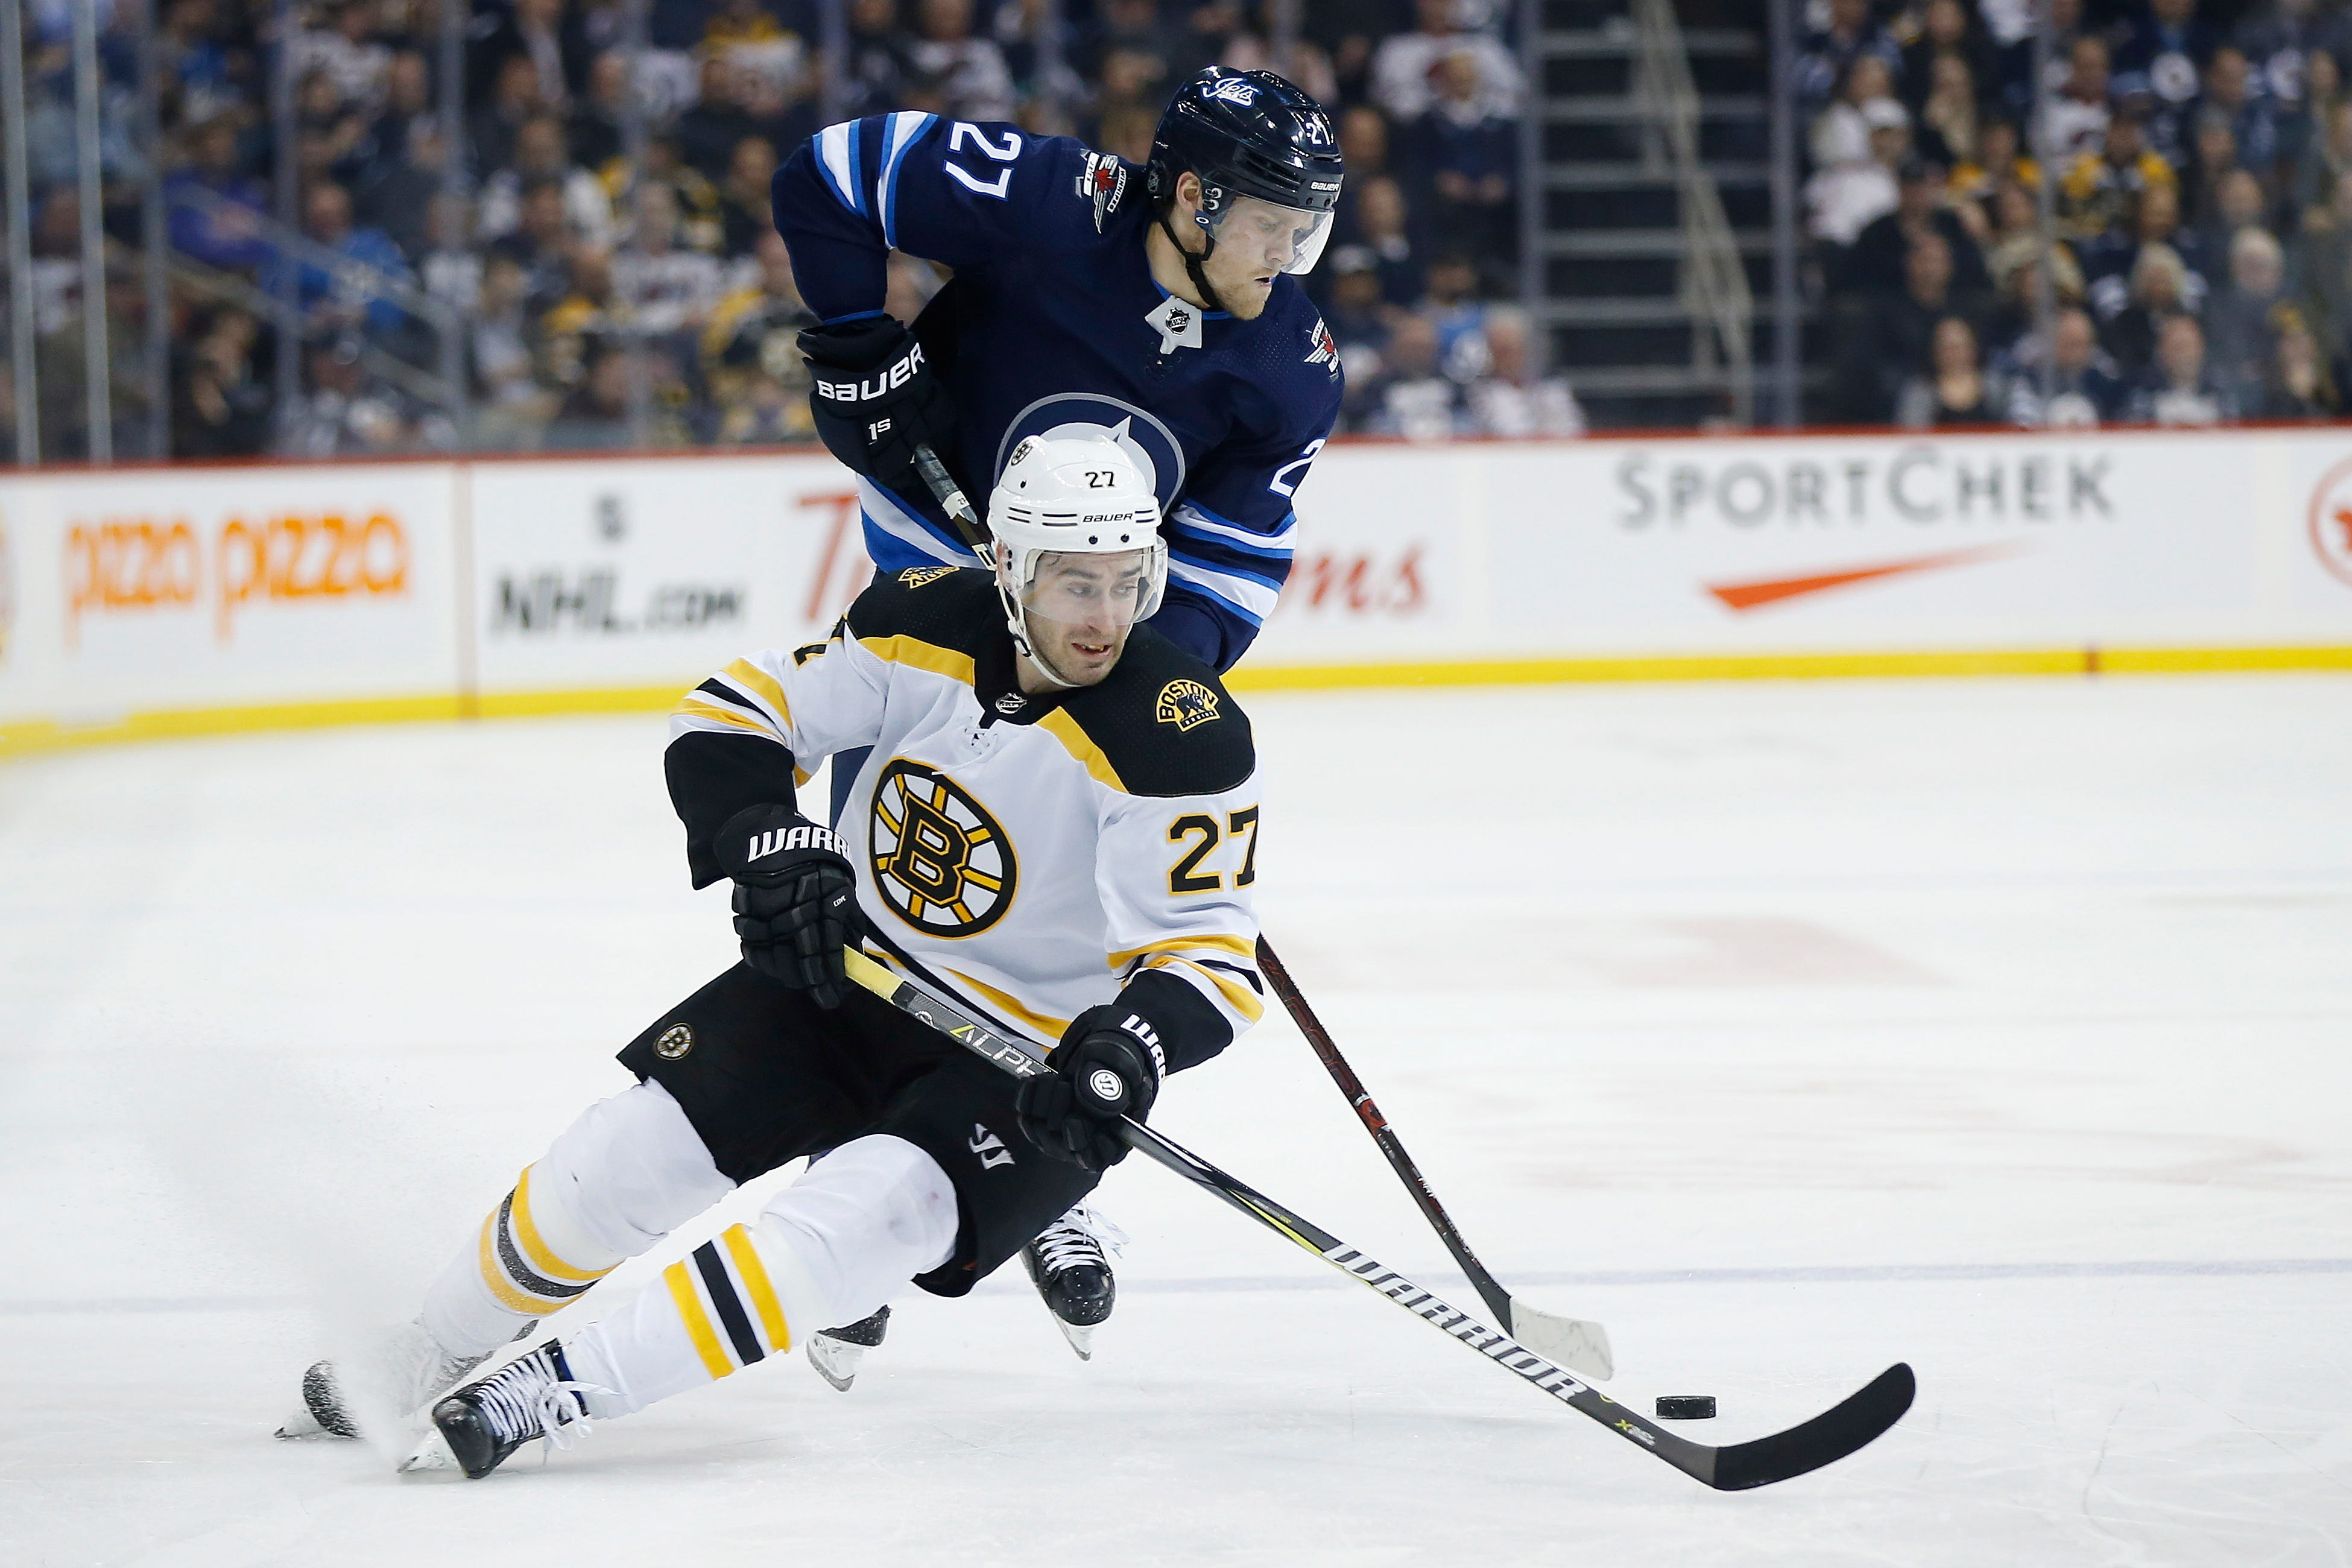 Scheifele has goal, 2 assists as Jets beat Bruins 4-3